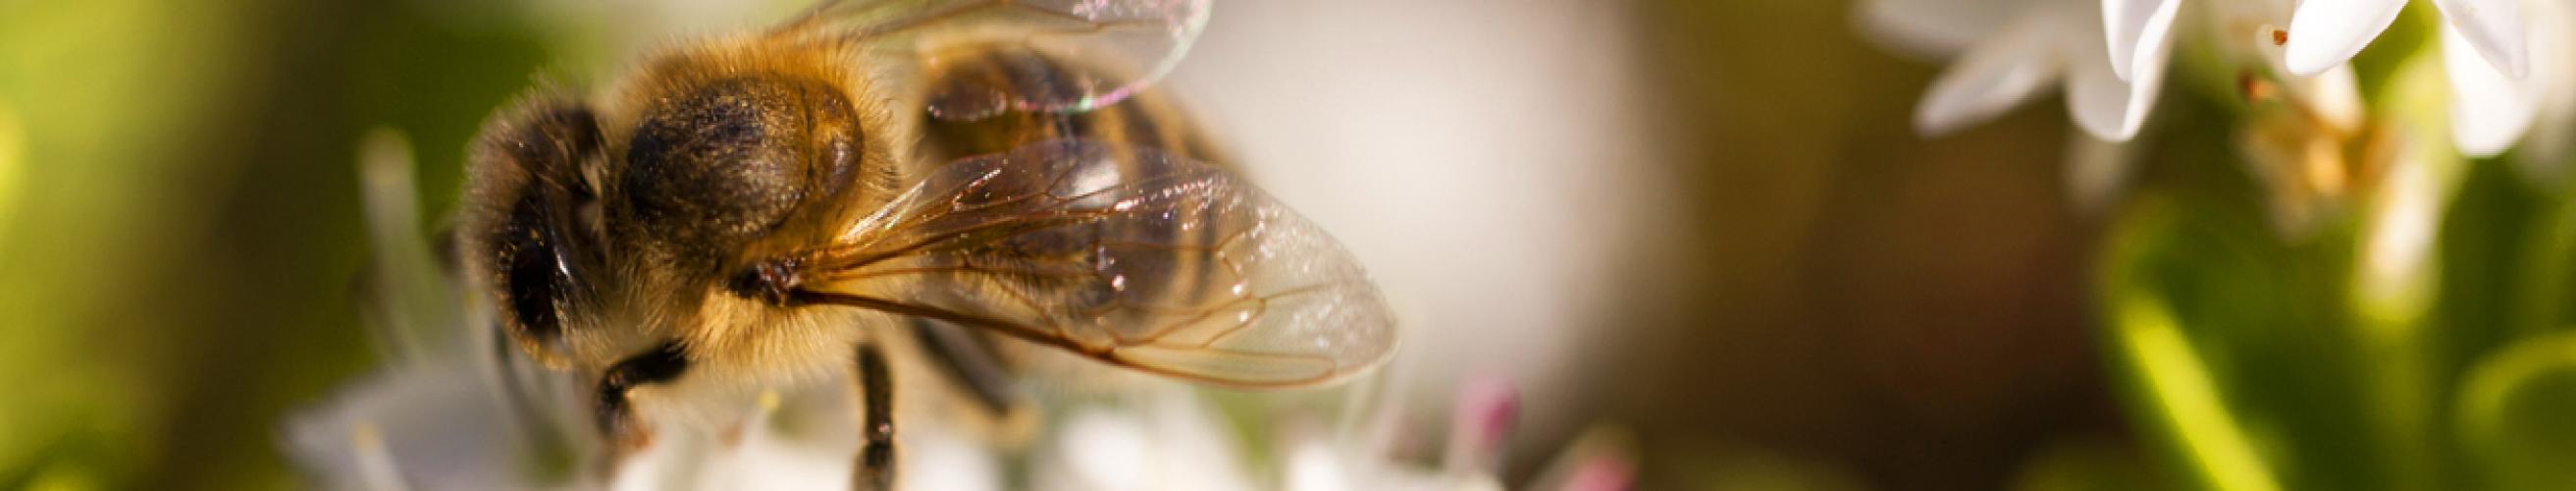 A Rocha_Banner_misc 12_bee on flower